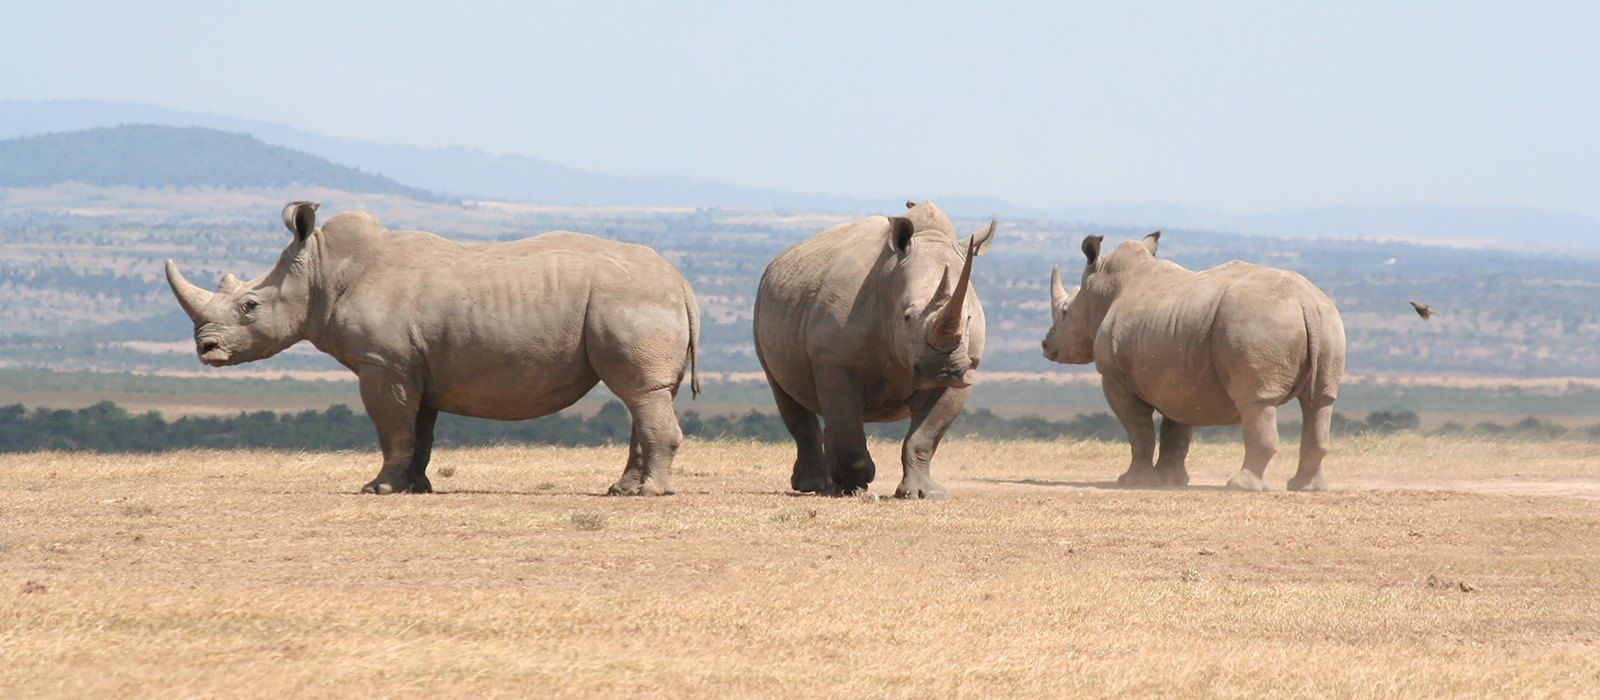 Kenia und Tansania: Kamel Trekking und Strandurlaub Urlaub 1